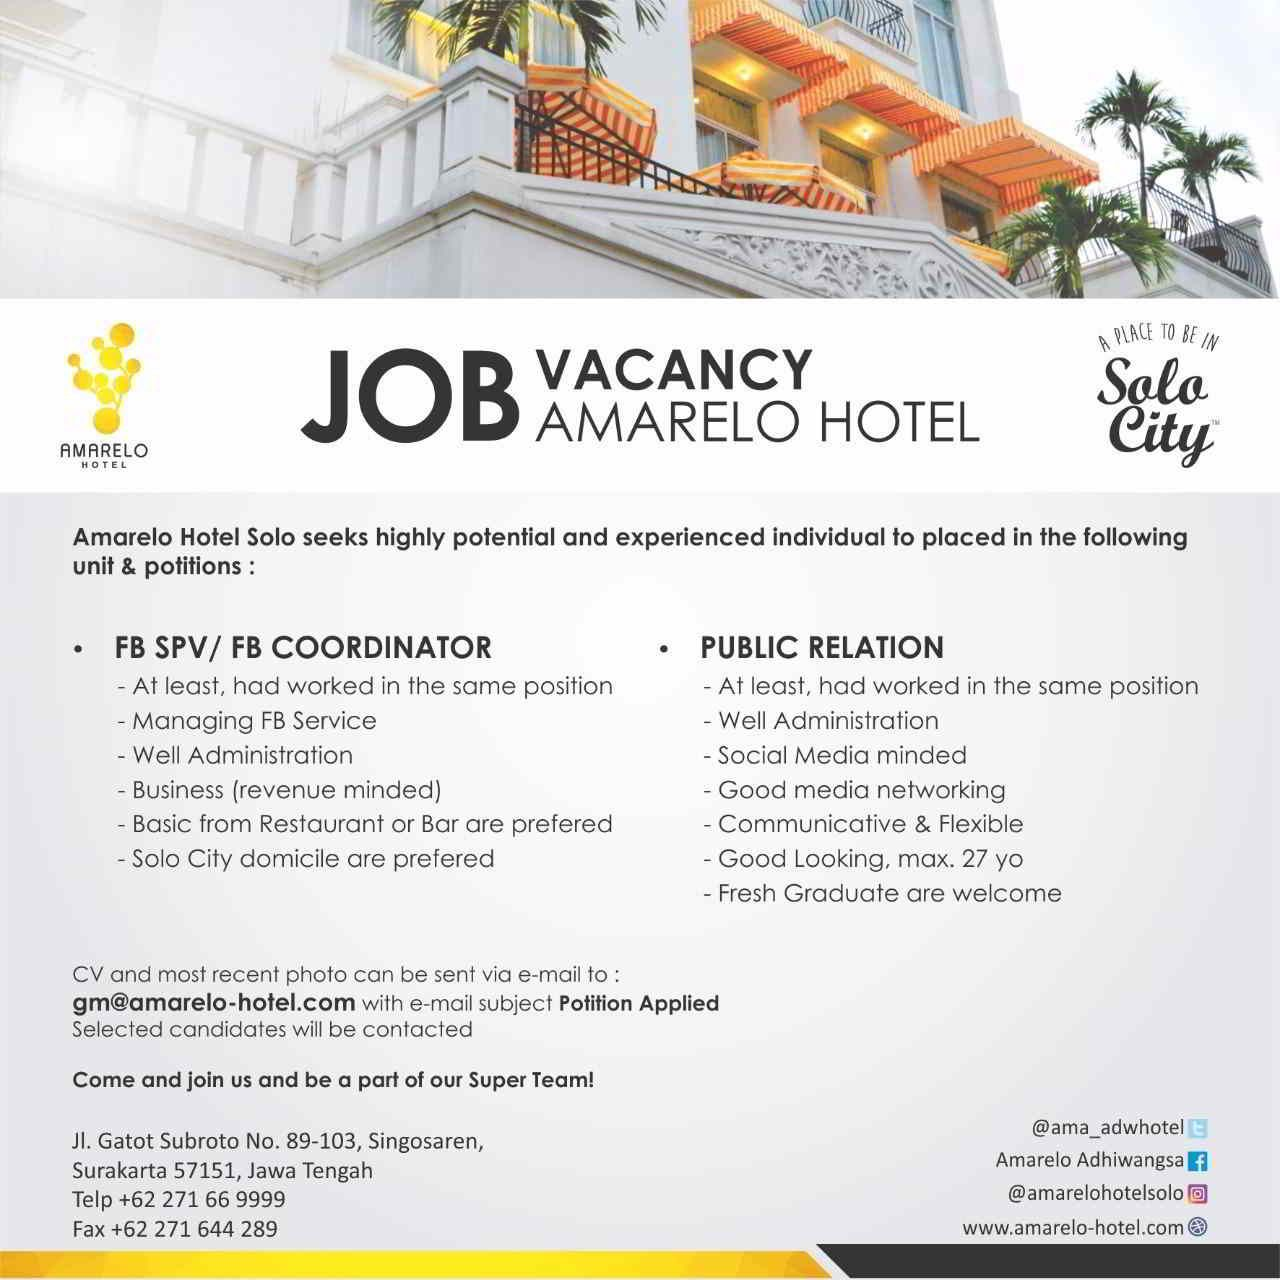 Fairmont Hotel Jakarta Job Vacancy Hotelier Indonesia Jobs Dubai Burj Khalifas